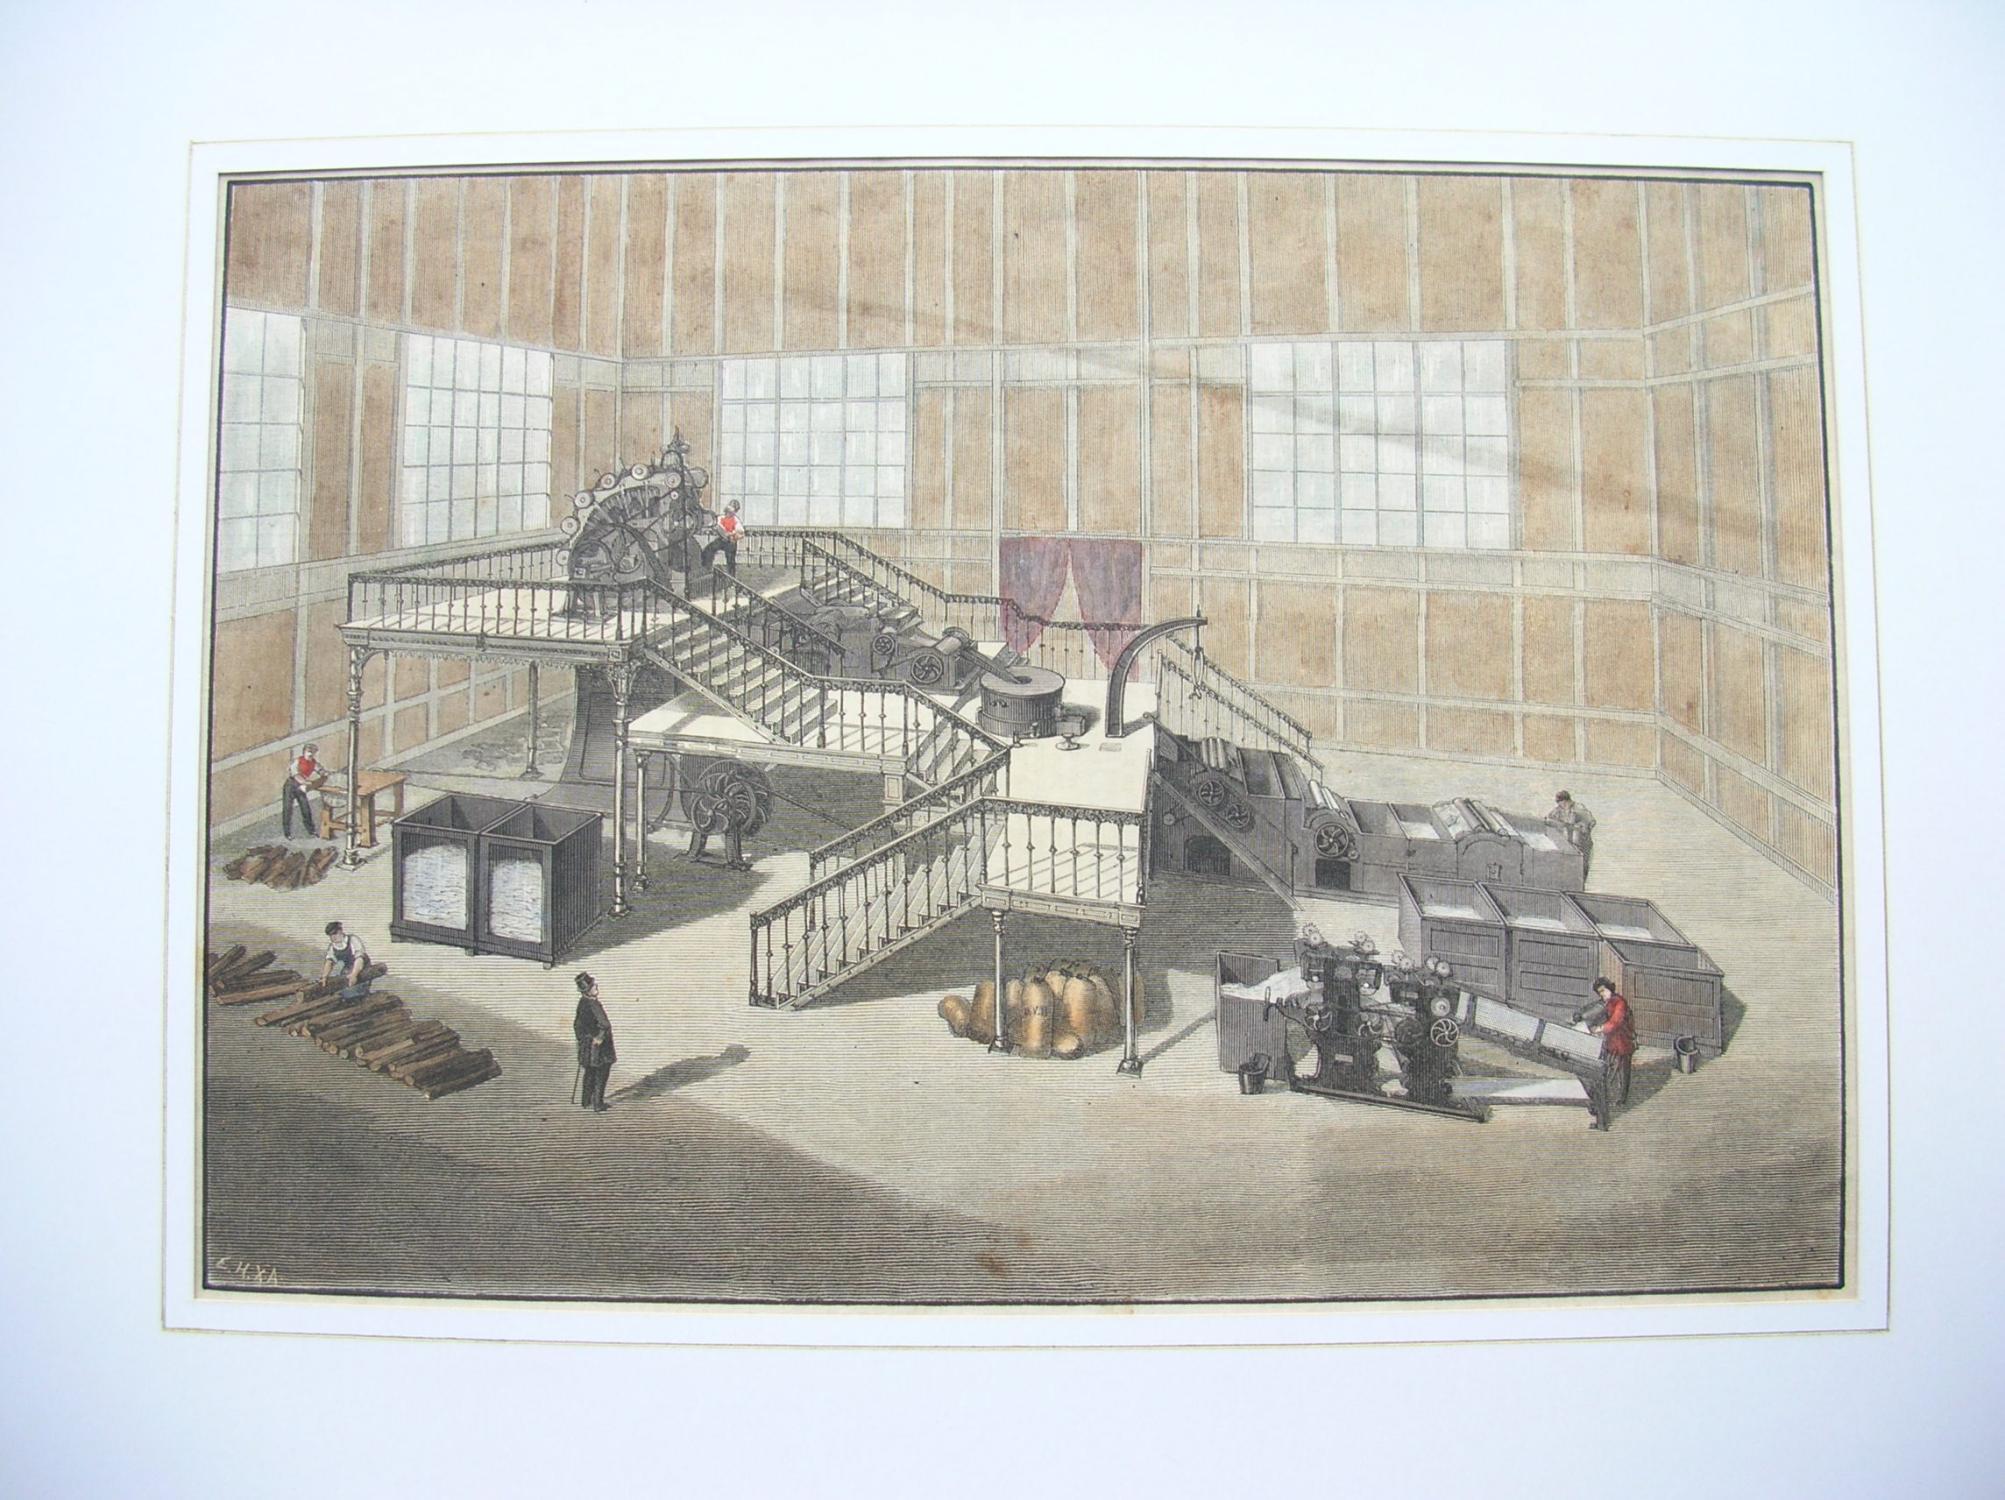 "Holzpapierstoff- (Holzzeug-) Maschine."" Patent H. Völter //: Papier /Papierherstellung)"